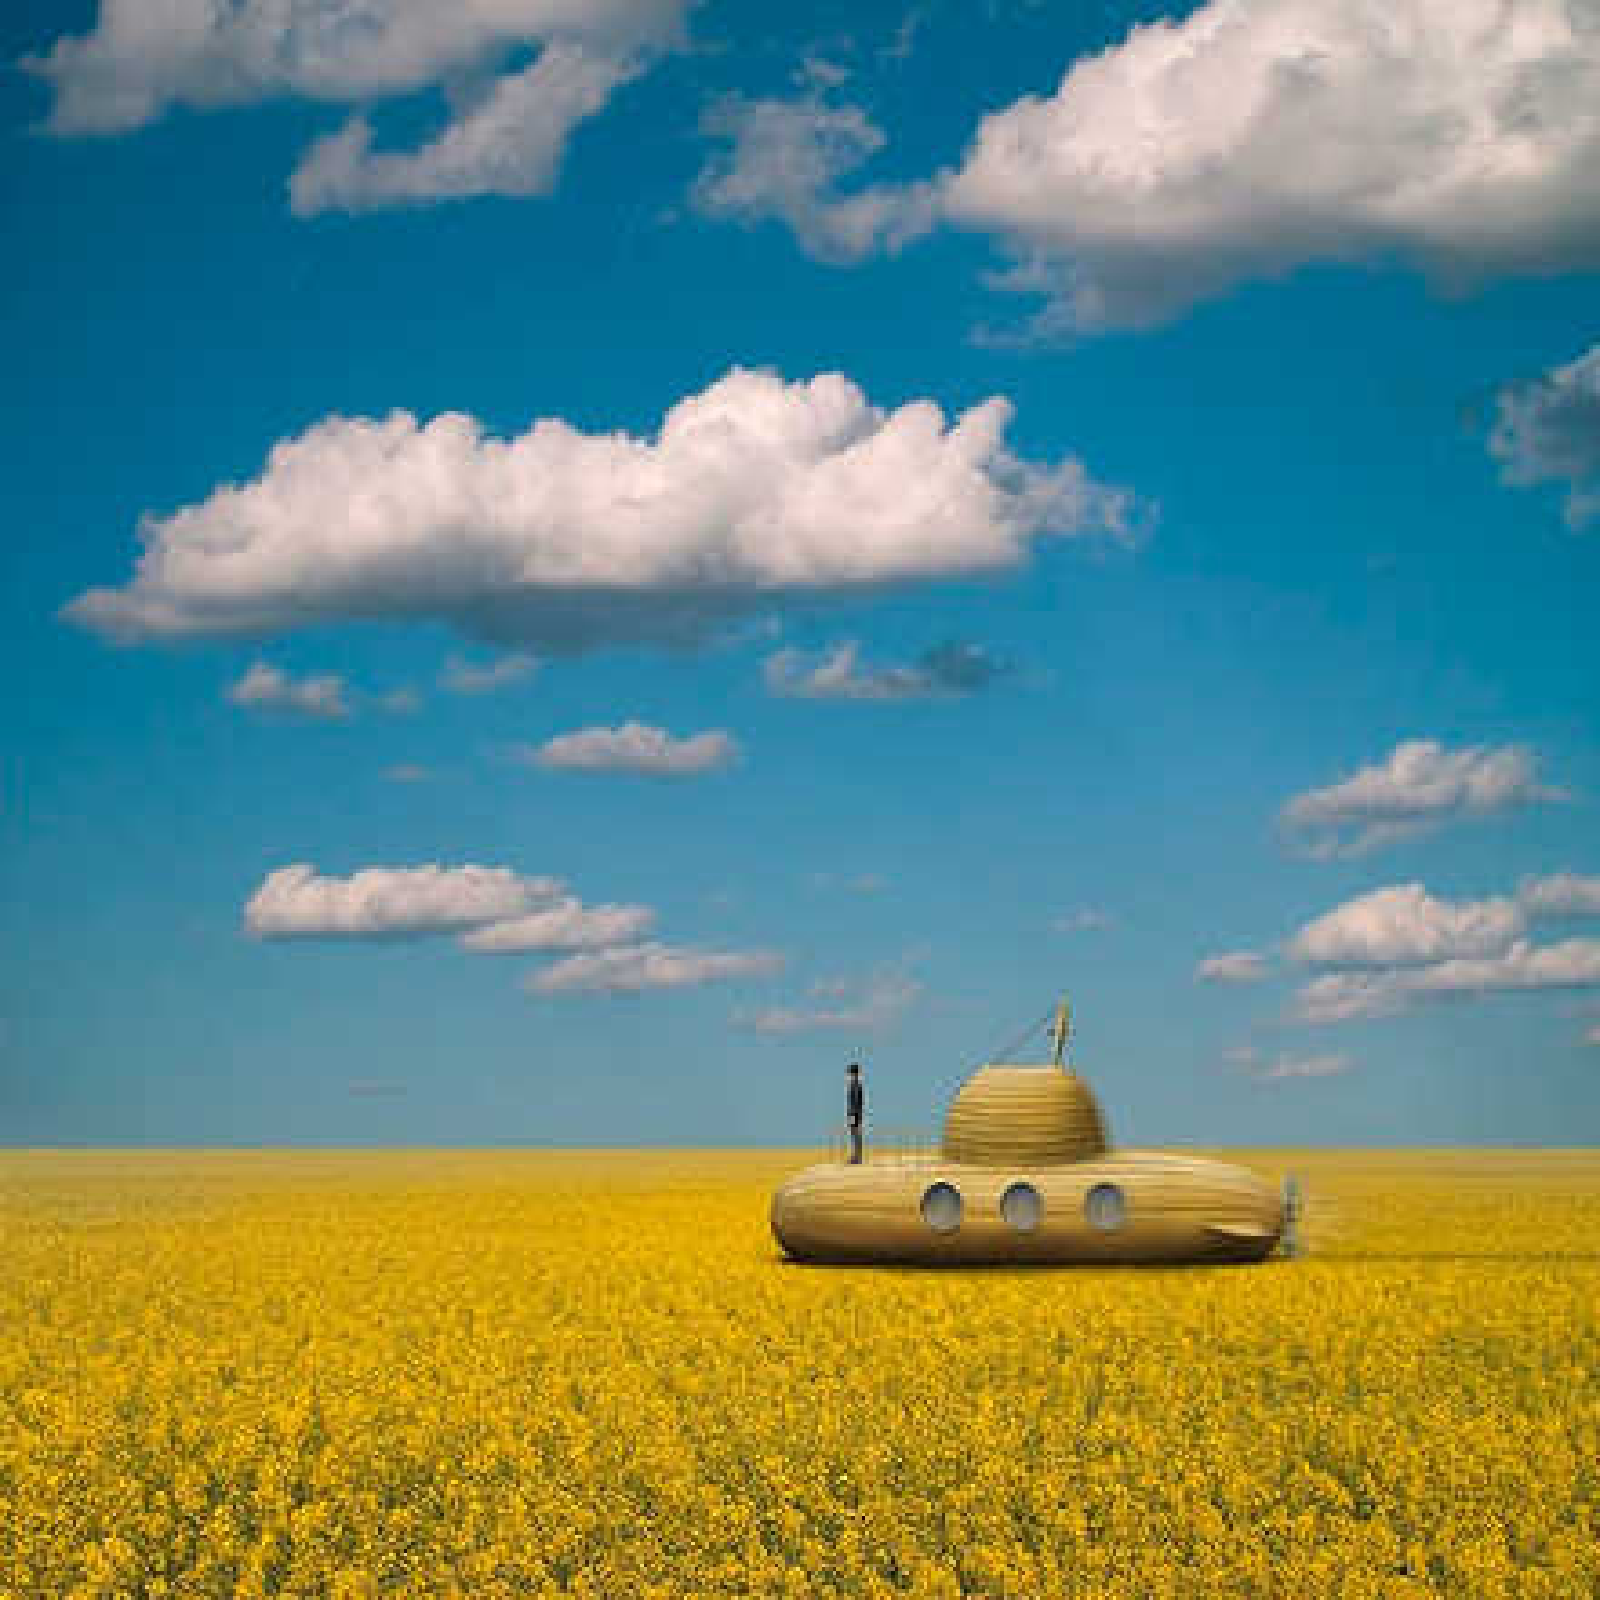 Yellow Submarine - Ceslovas Cesnakevicius